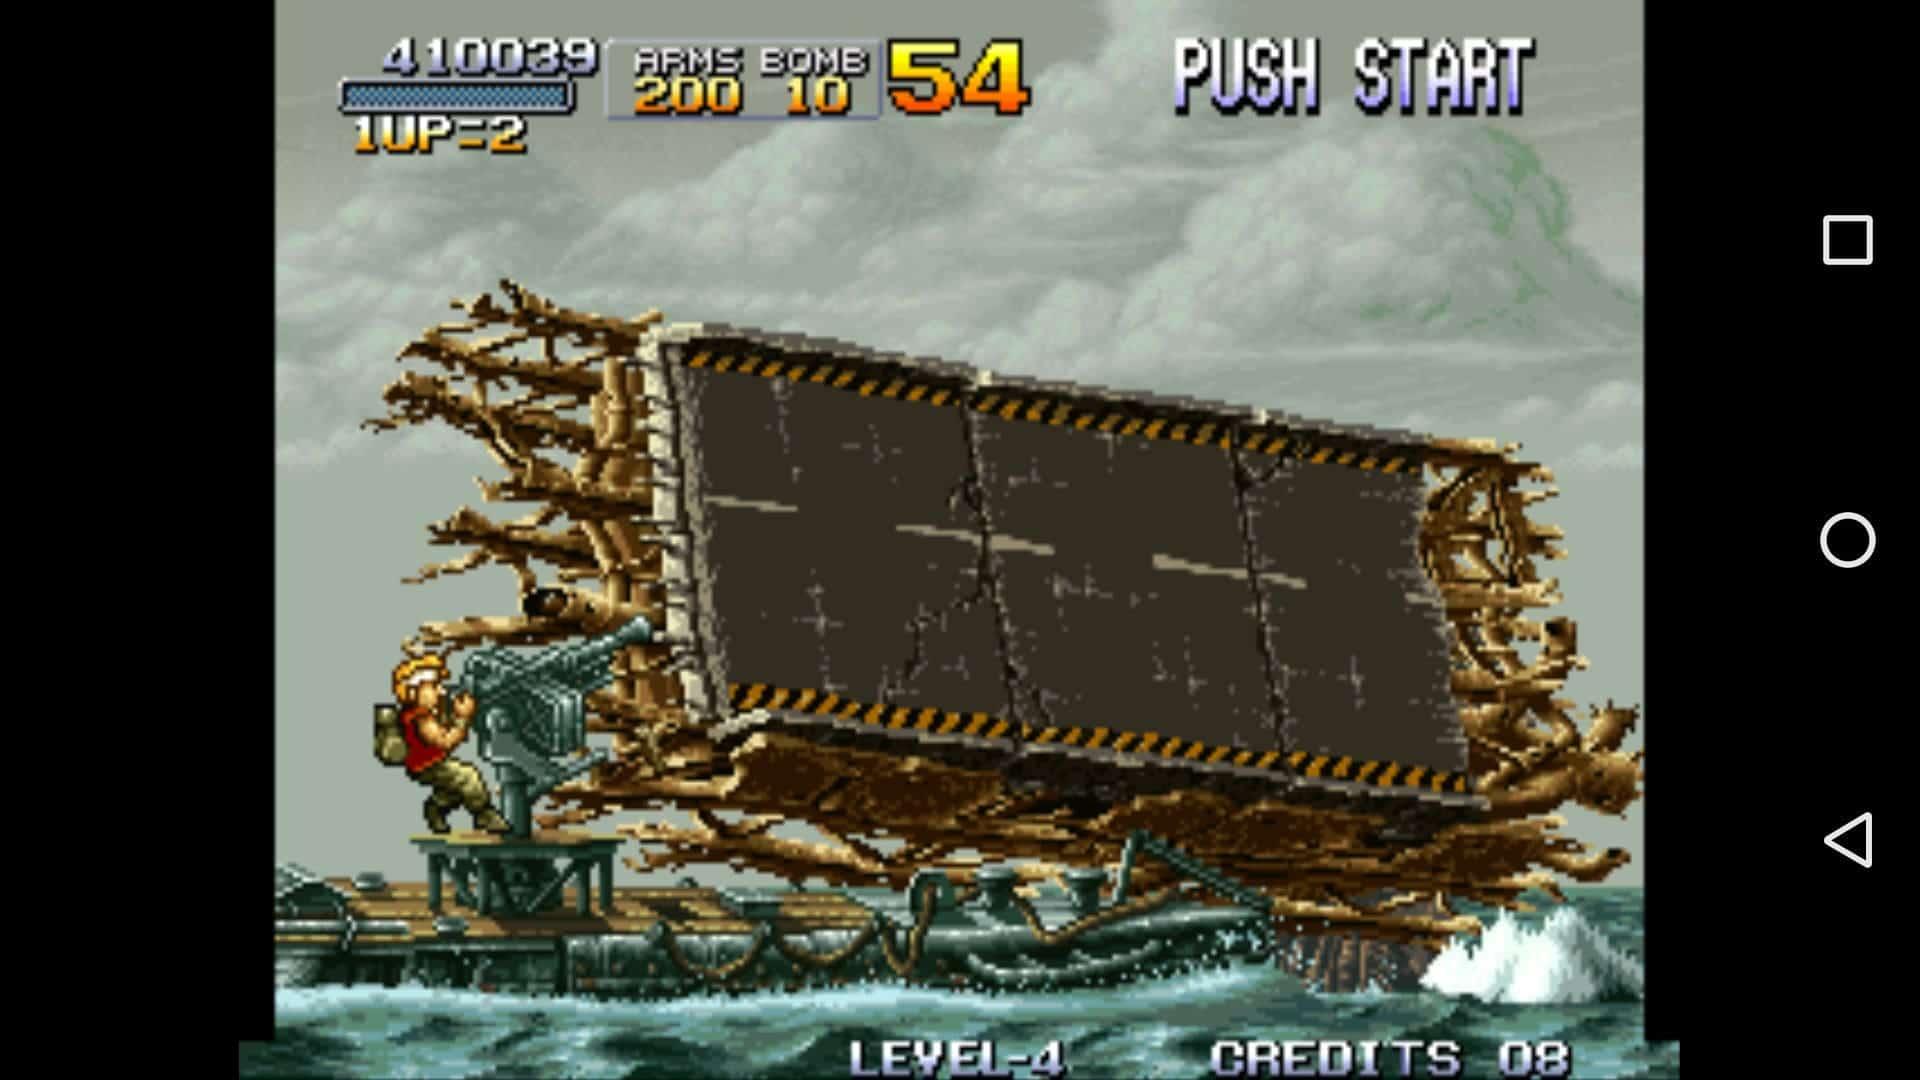 Screenshot from the Metal Slug game